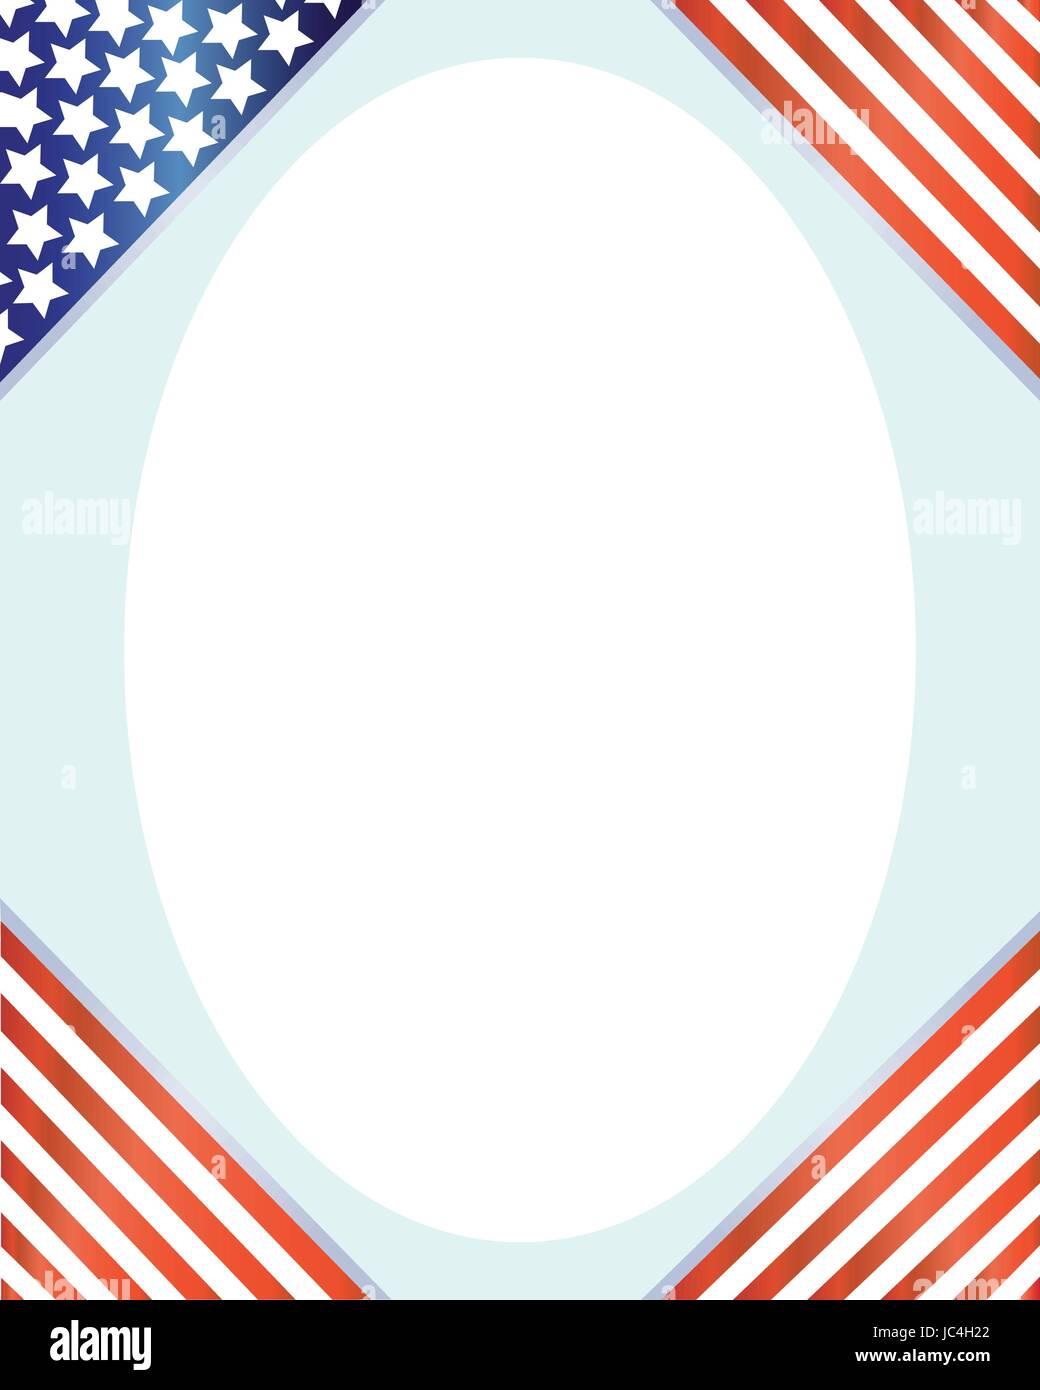 USA Flagge Ecke Frame-Vektor-Bild Vektor Abbildung - Bild: 145160010 ...